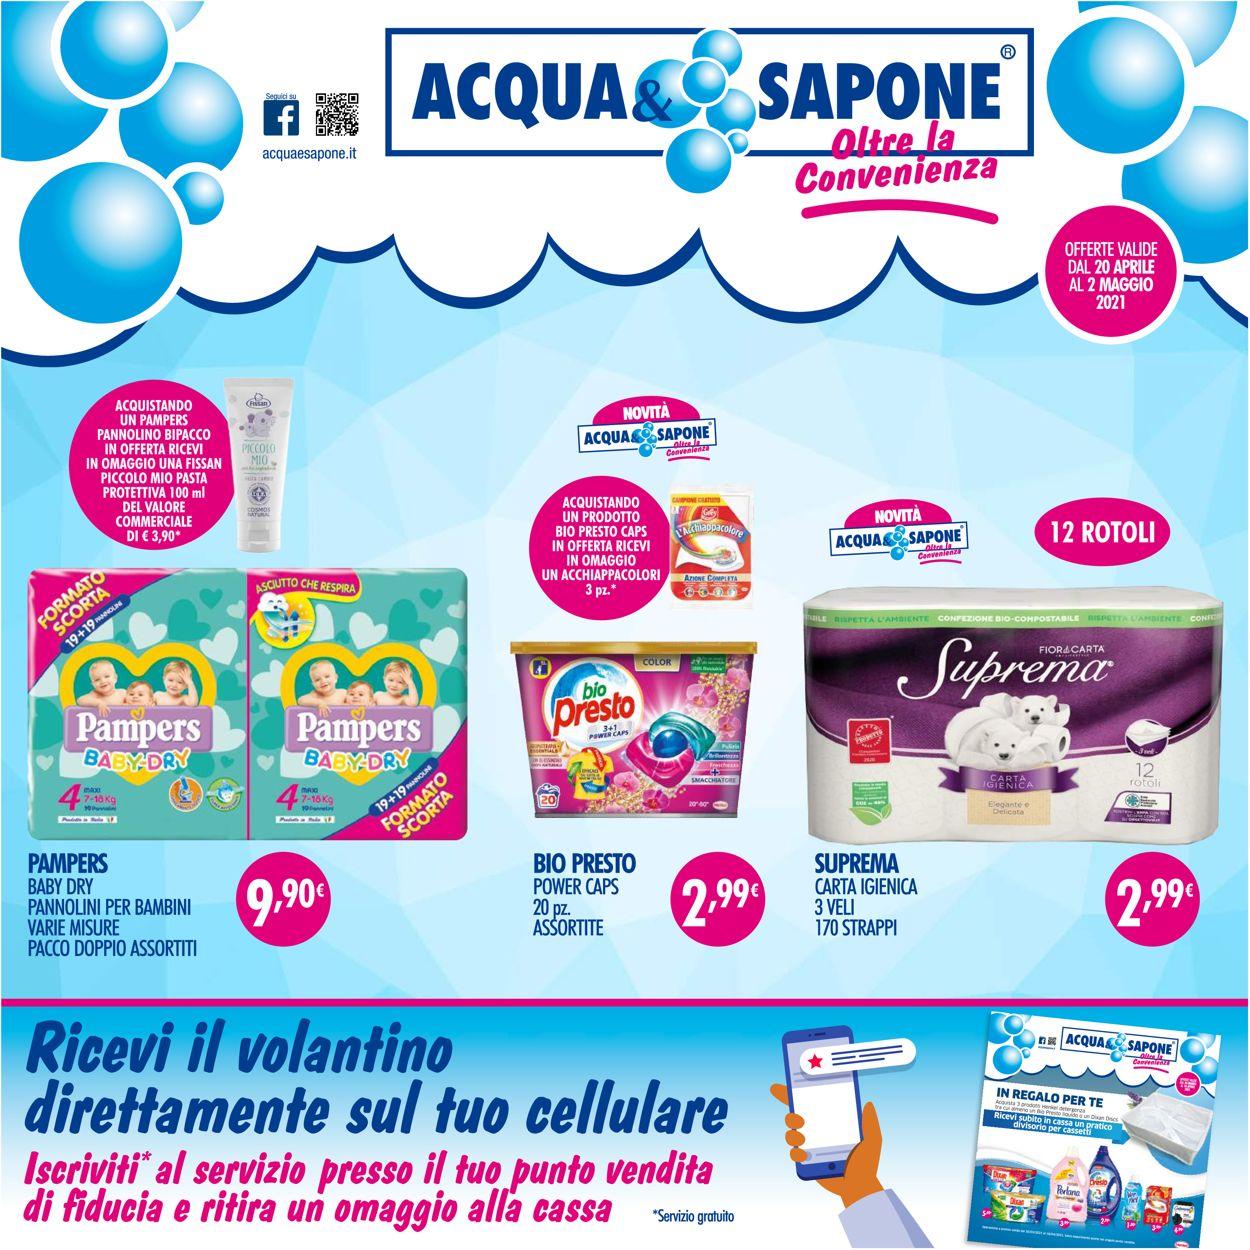 Volantino Acqua & Sapone - Offerte 20/04-02/05/2021